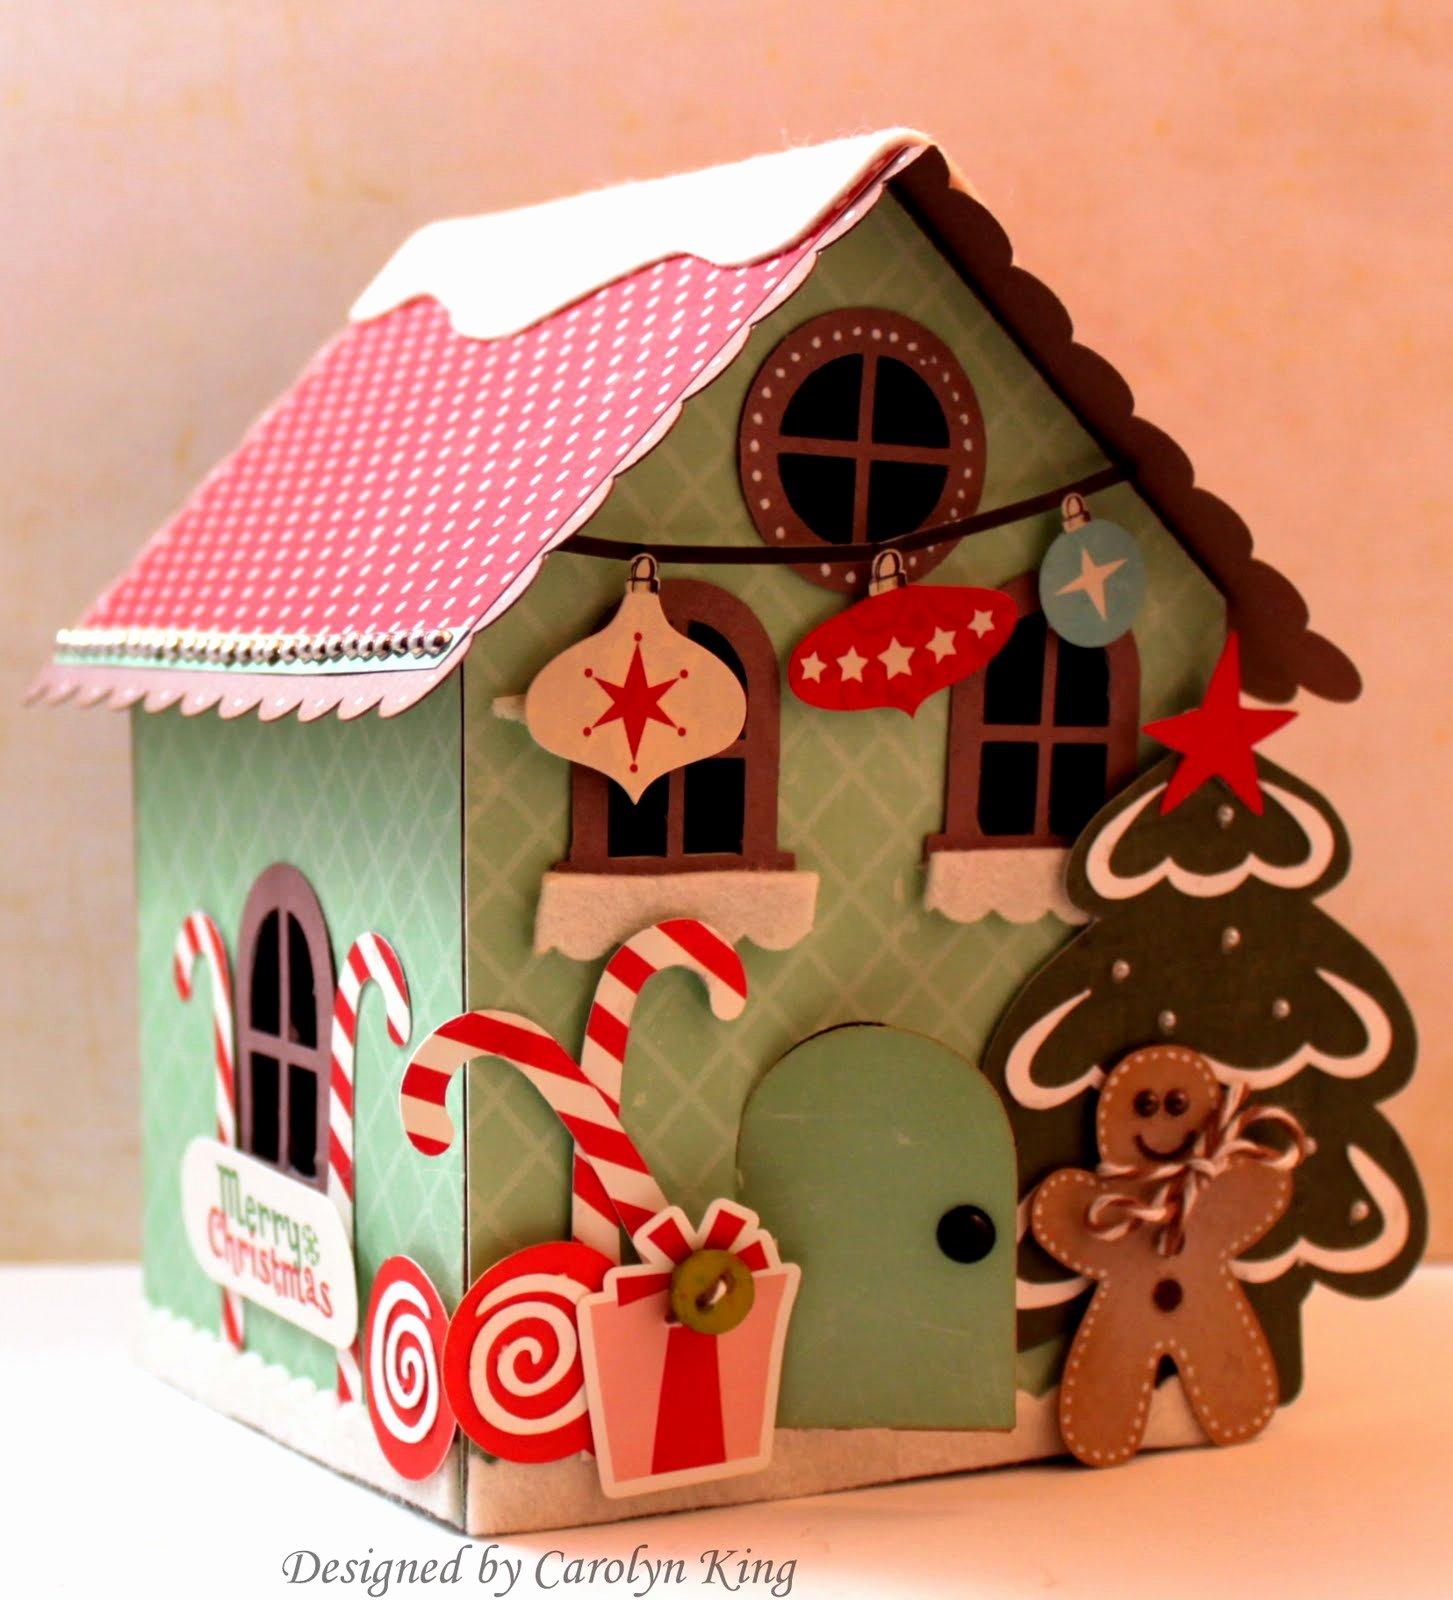 Cardboard Gingerbread House Elegant My Blog Gingerbread House